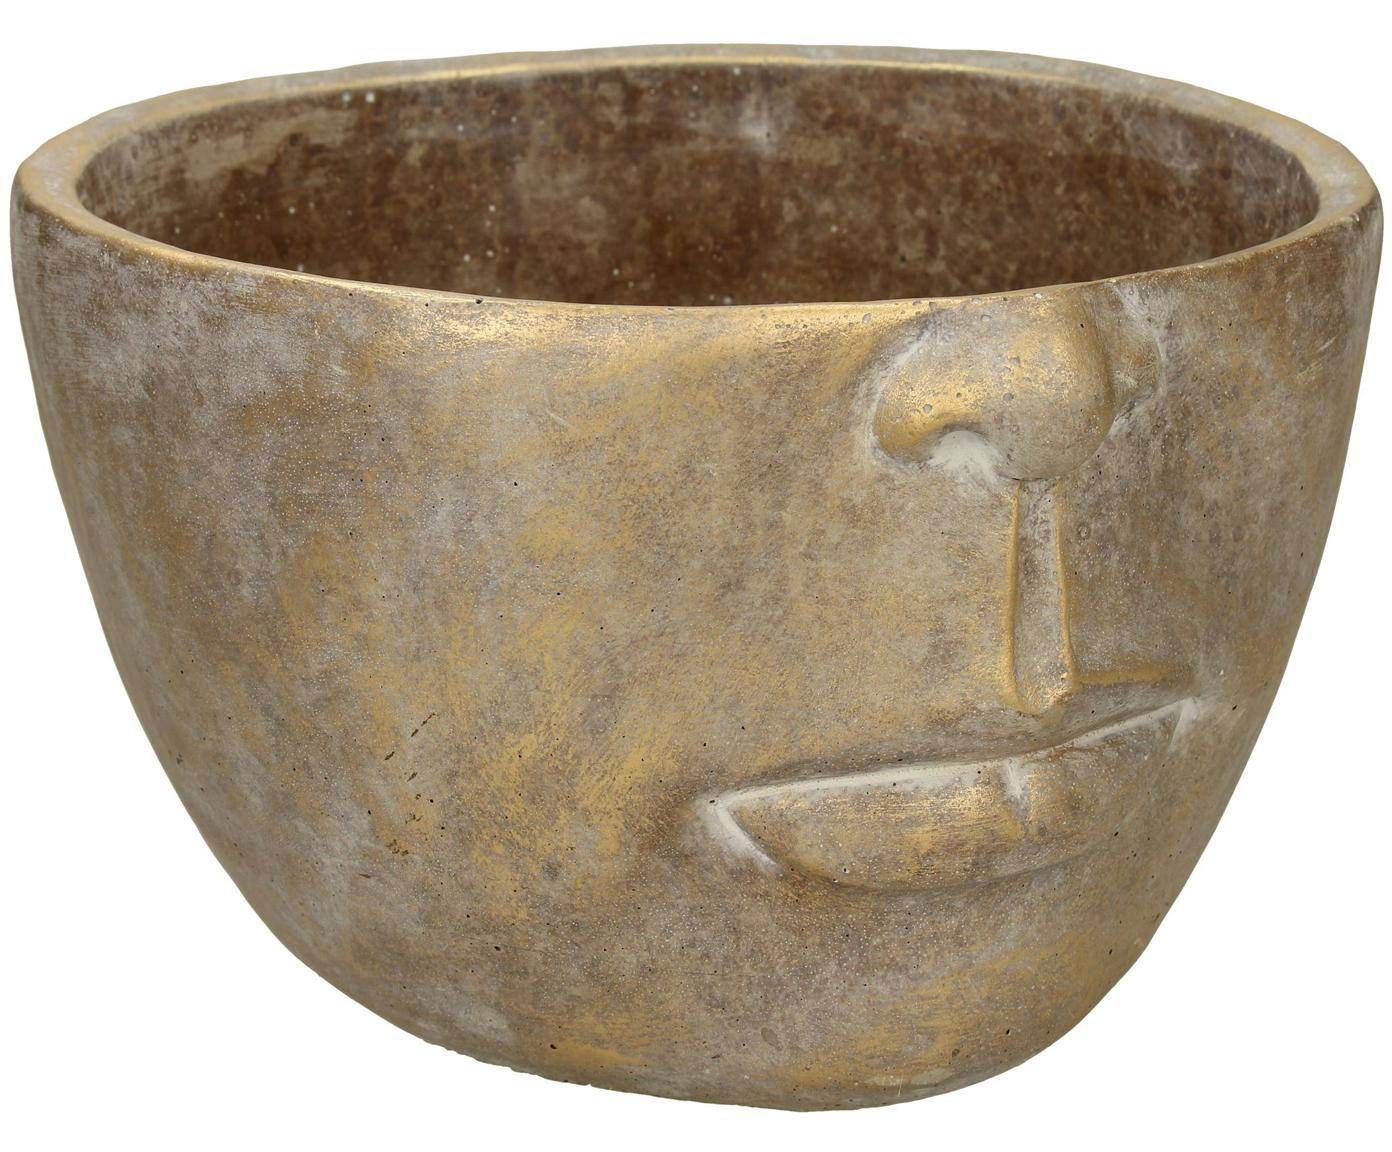 Portavaso Golden Face, Cemento, Dorato con  finitura antica, Larg. 23 x Alt. 14 cm